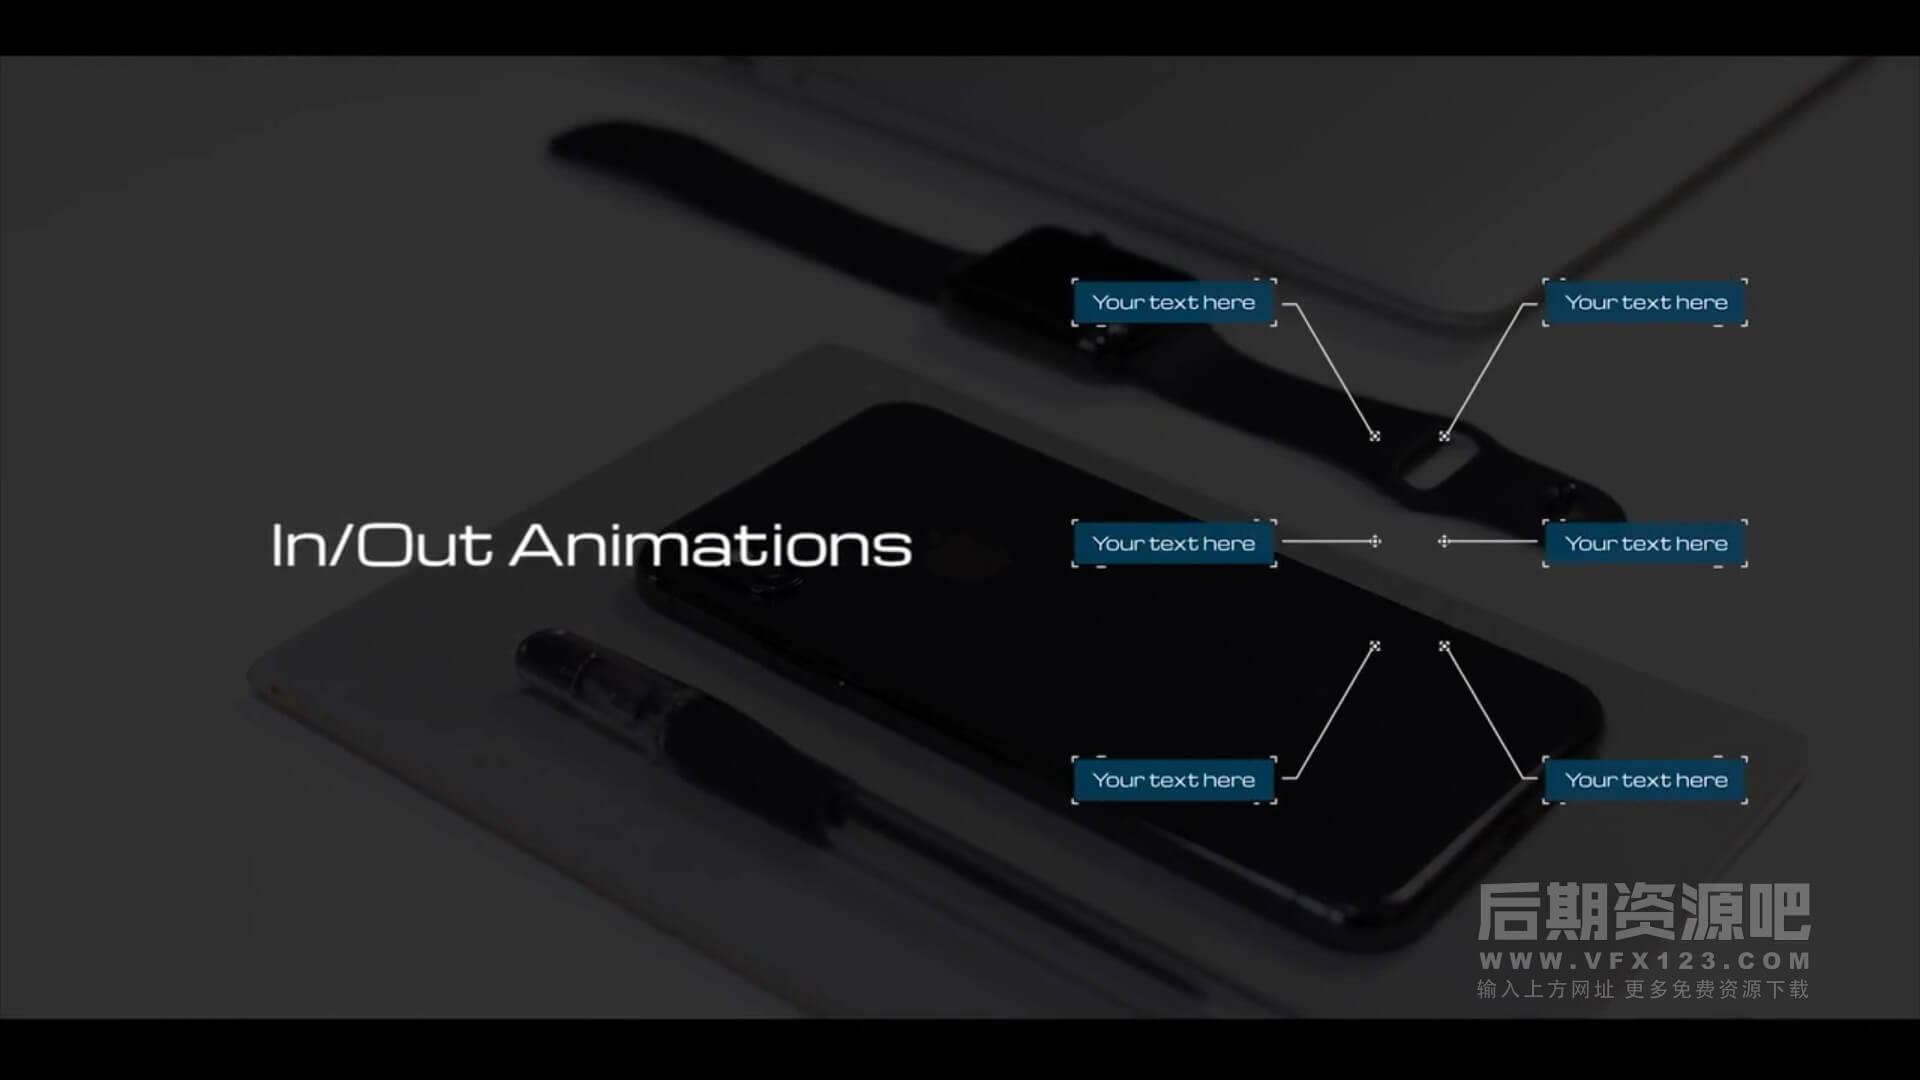 fcpx插件 18种高科技数码风格线条呼出标题注释动画模板 Hi-Tech Call Outs